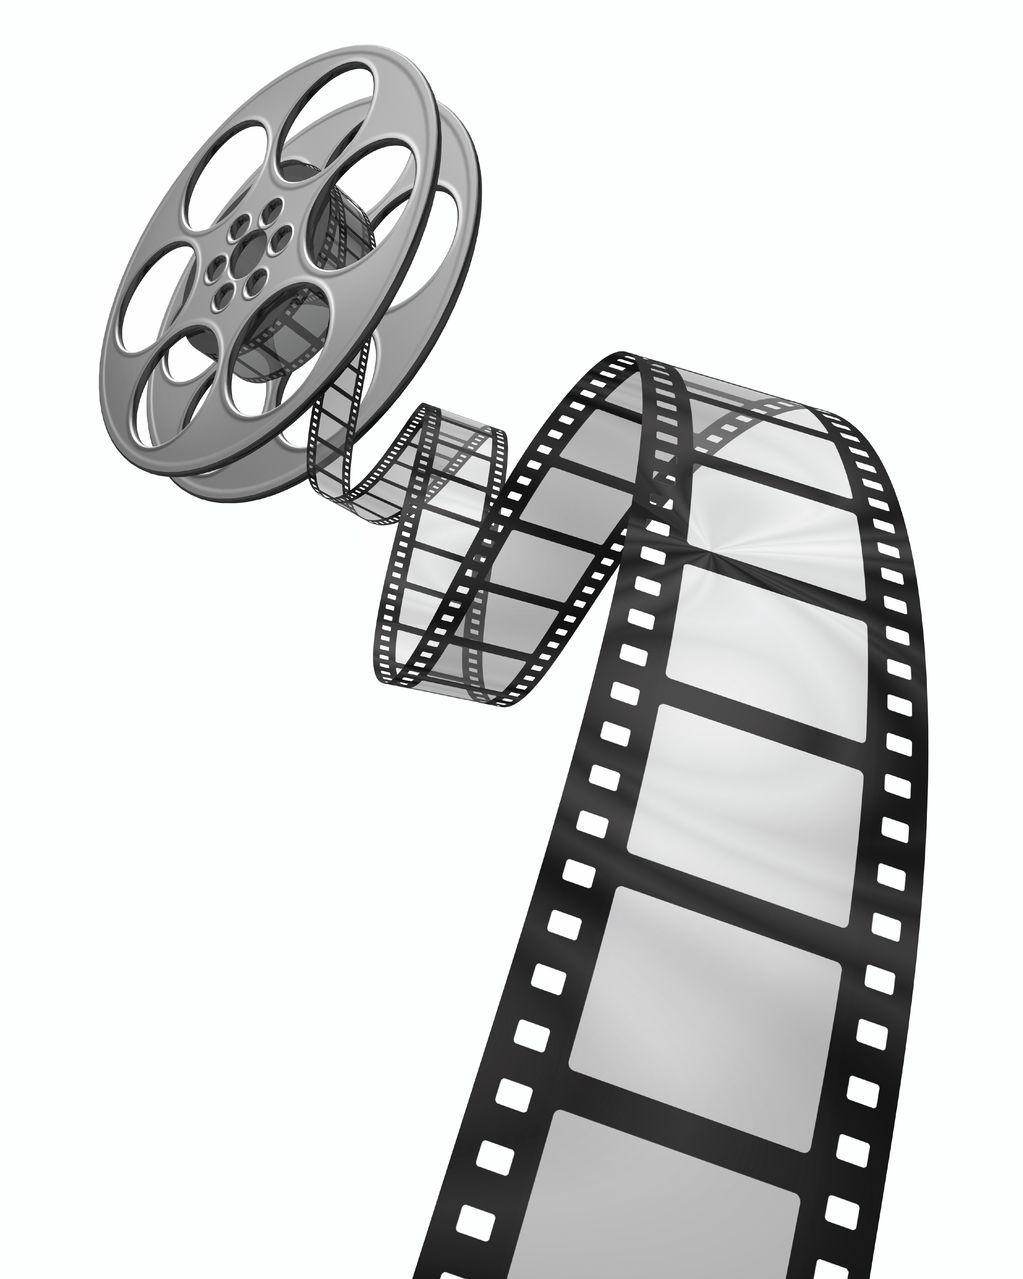 Flying_Film_Reel.jpg (8×8)  Bobines de film, Pellicule